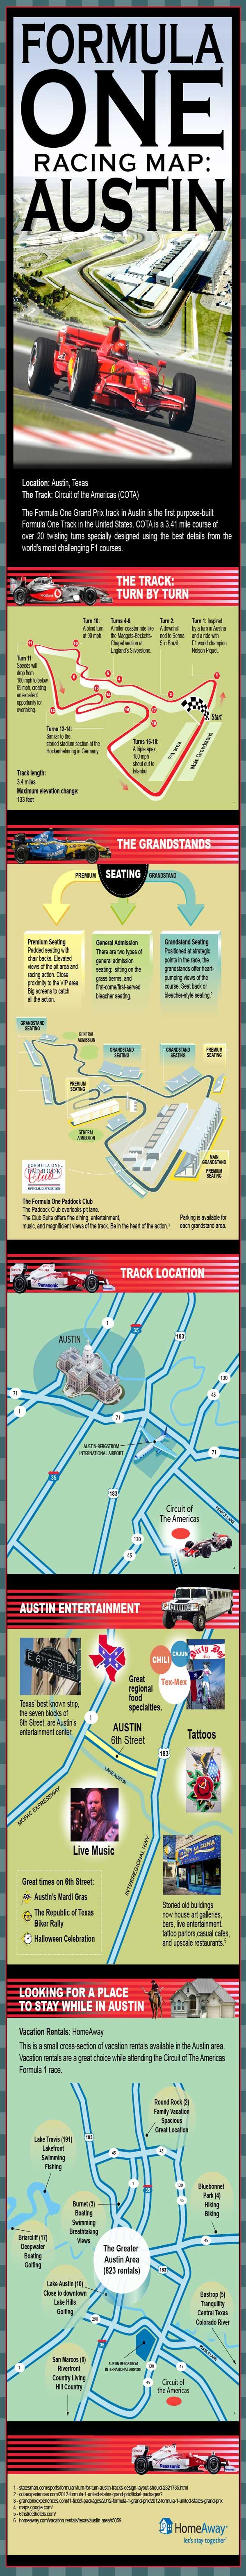 Austin 2012 Infographic